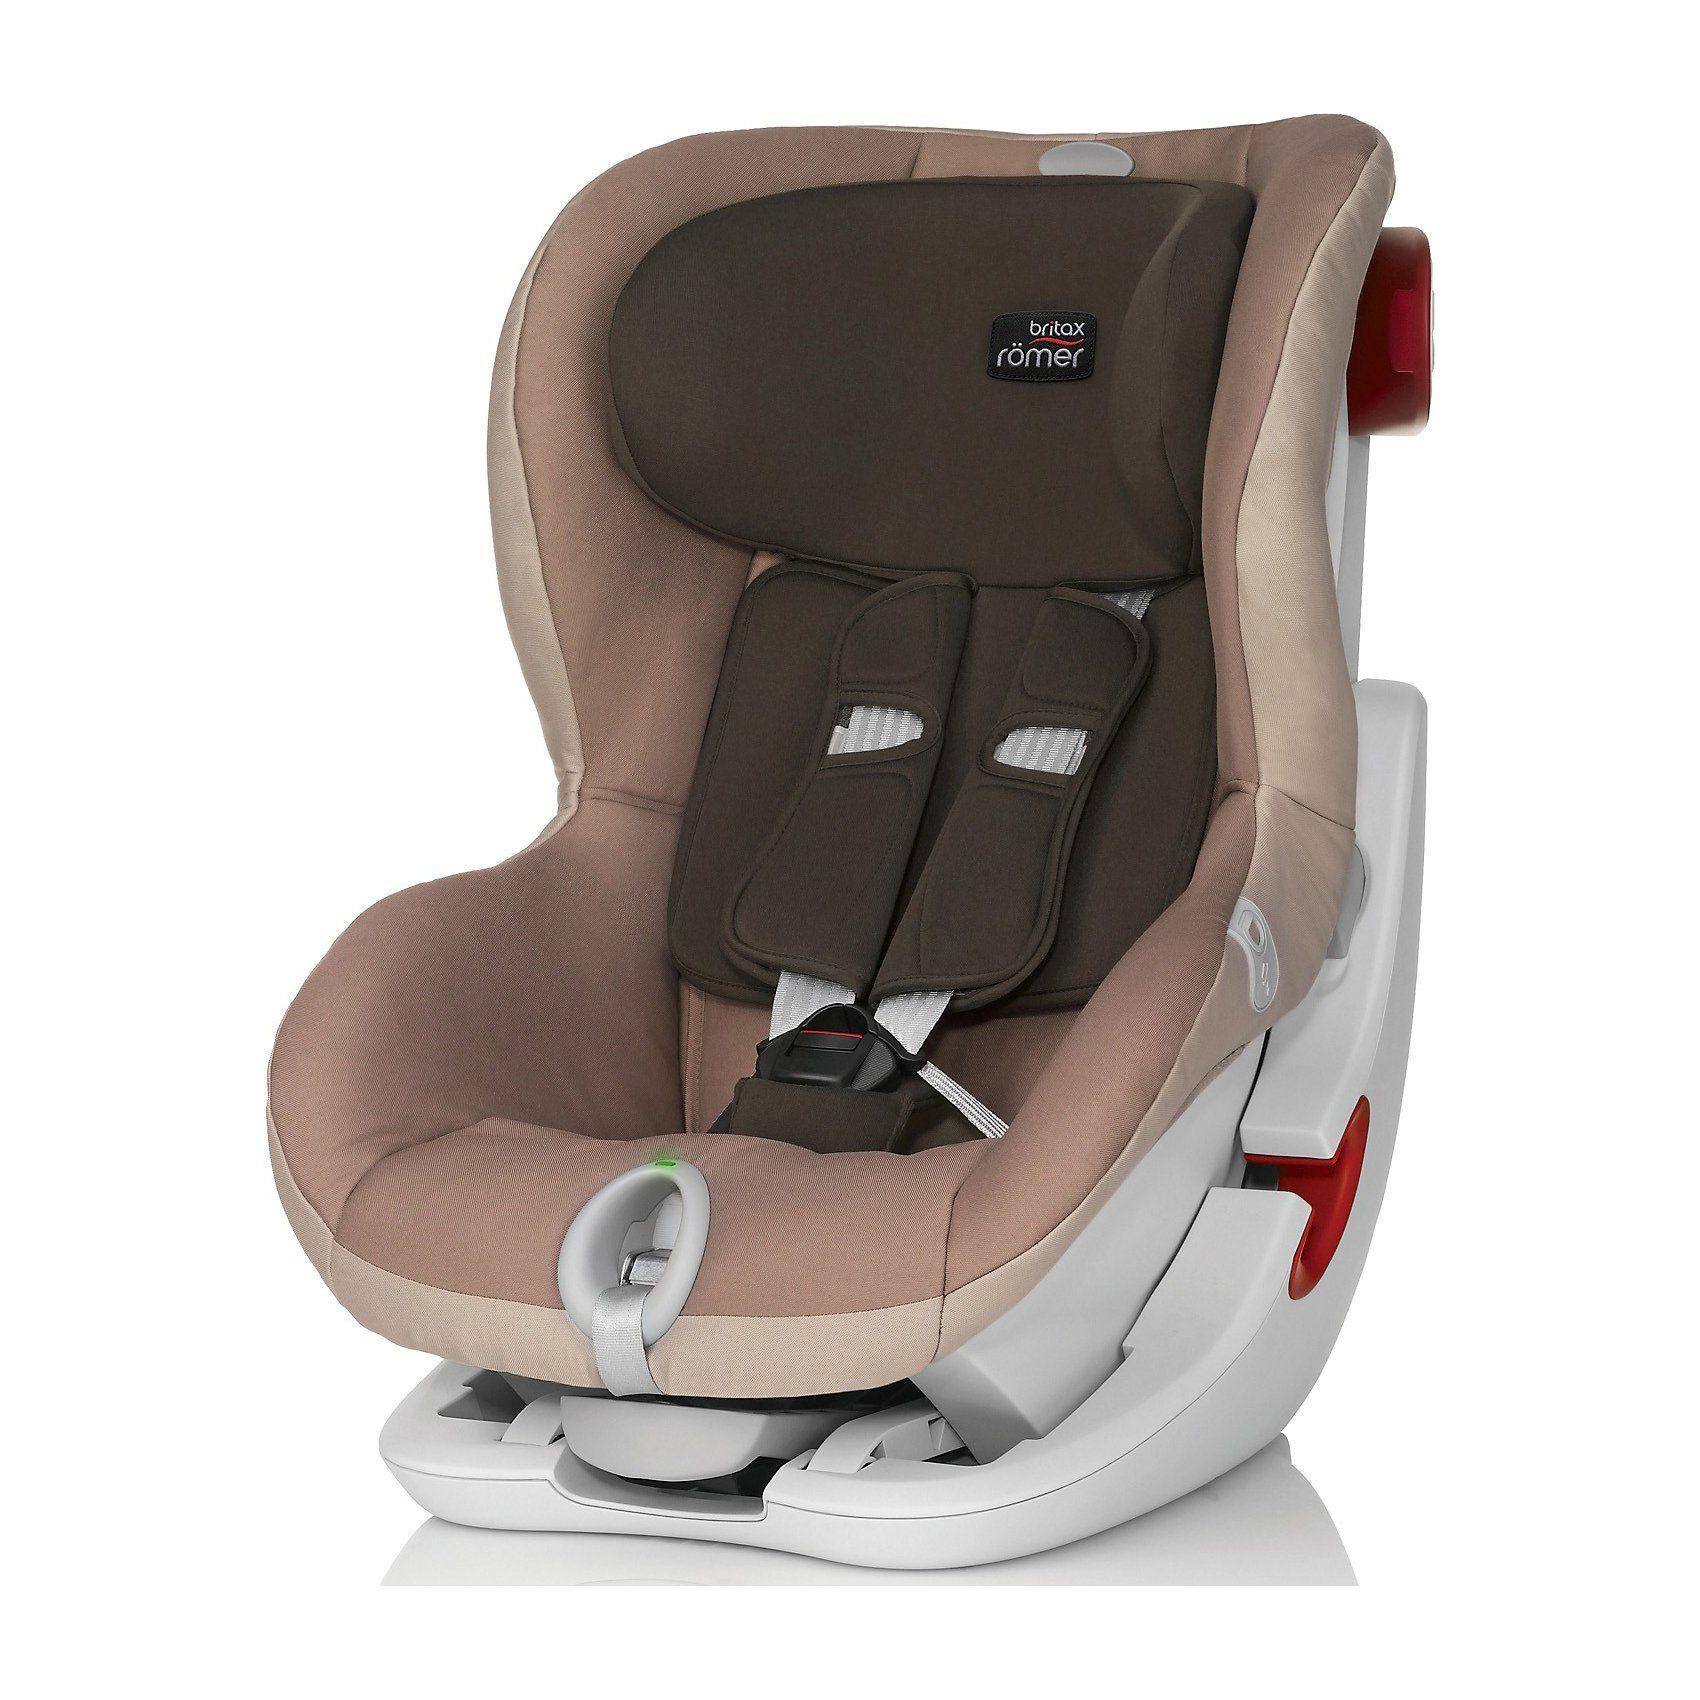 Britax Römer Auto-Kindersitz King II LS, Taupe Grey, 2015